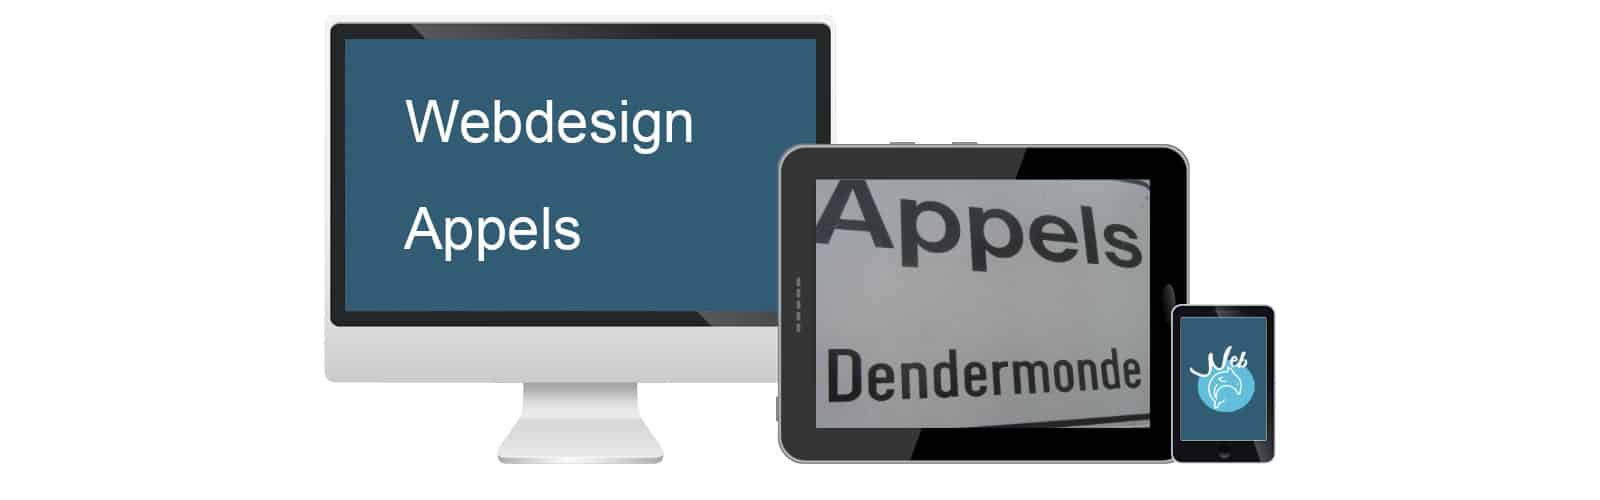 Webdesign Appels - webdolfijn